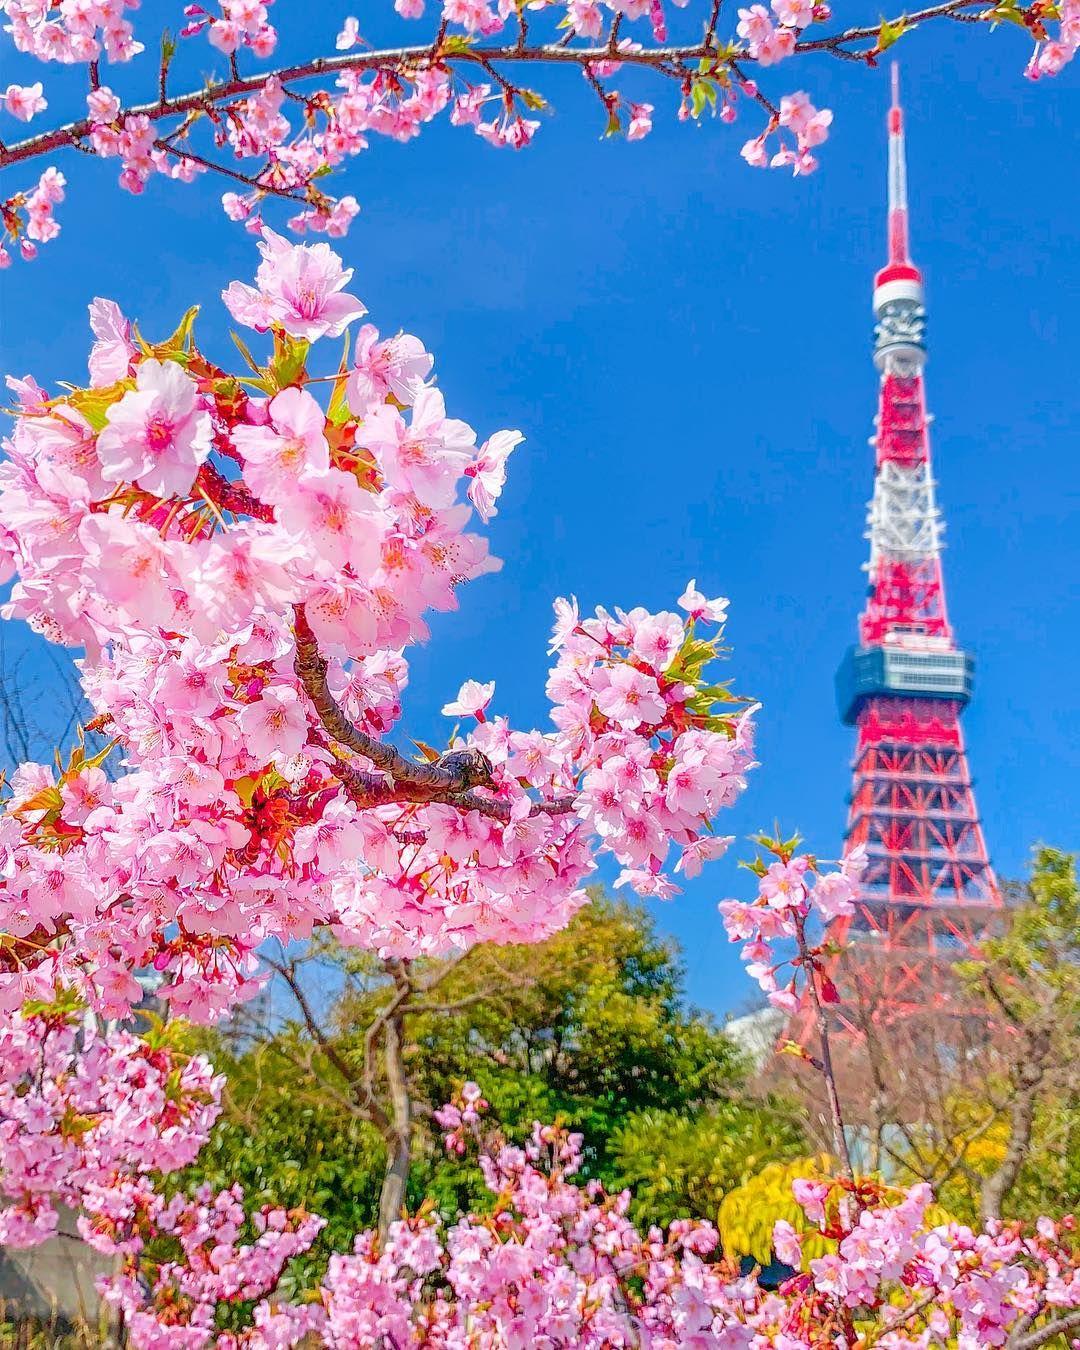 Kawazu Sakura Early Flowering Variety Of Cherry Tree And Tokyo Tower At Shiba Koen Park In Tokyo It Is One Of T Poster Bunga Lukisan Bunga Bunga Sakura